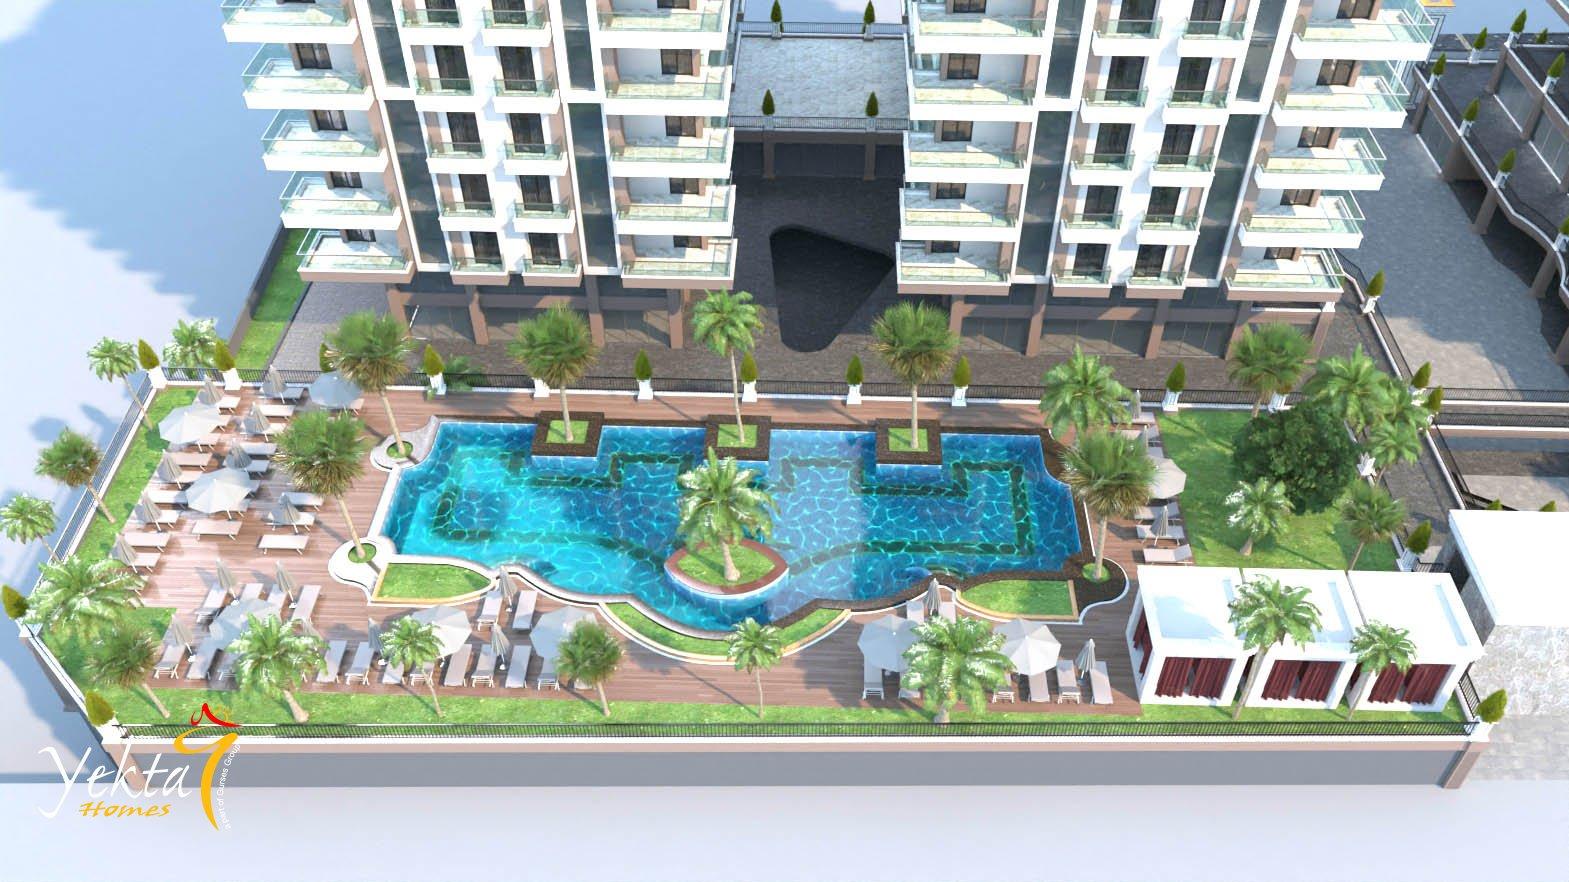 Yekta Kingdom Trade Center — Продажа апартаментов в новом комплексе Аланье (Махмутлар)